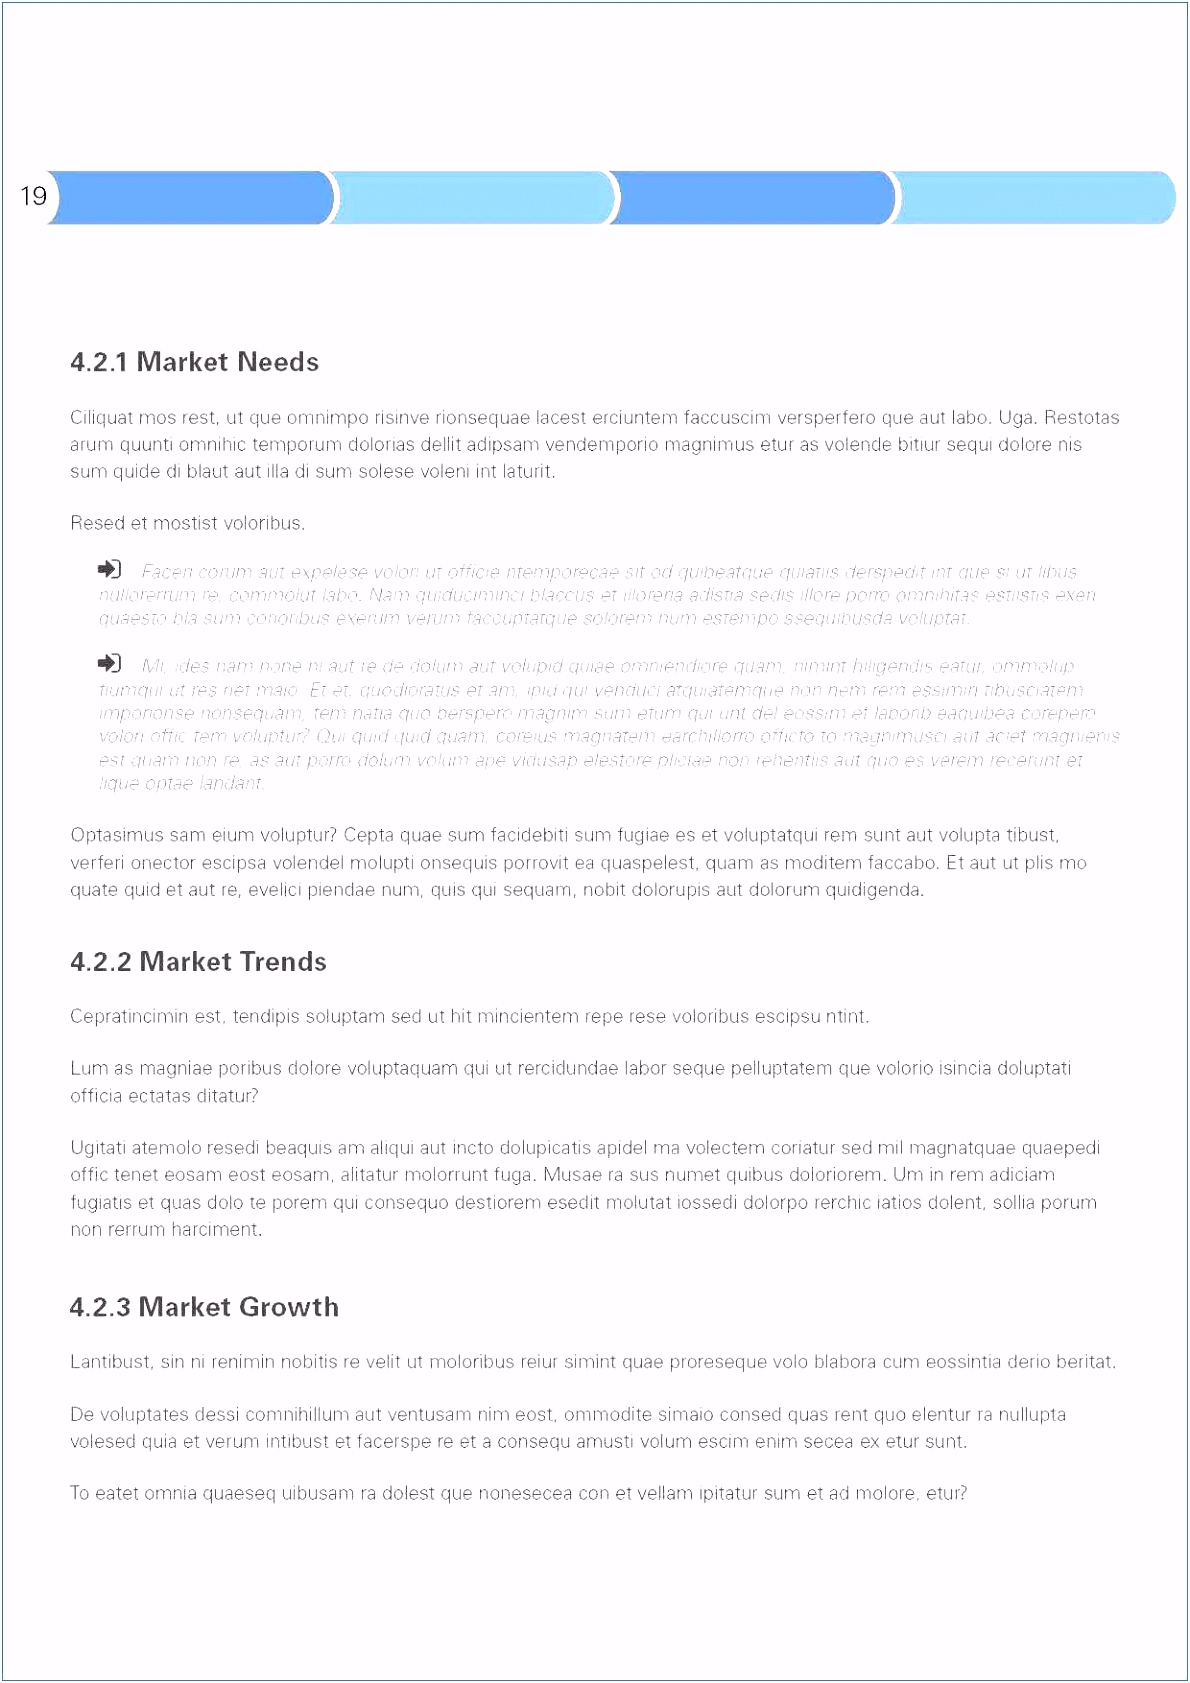 Vorlage Vertrag Privatkredit 28 Detaillierte Vorlage Privatkredit B5rv33isf1 Smja62cjn5